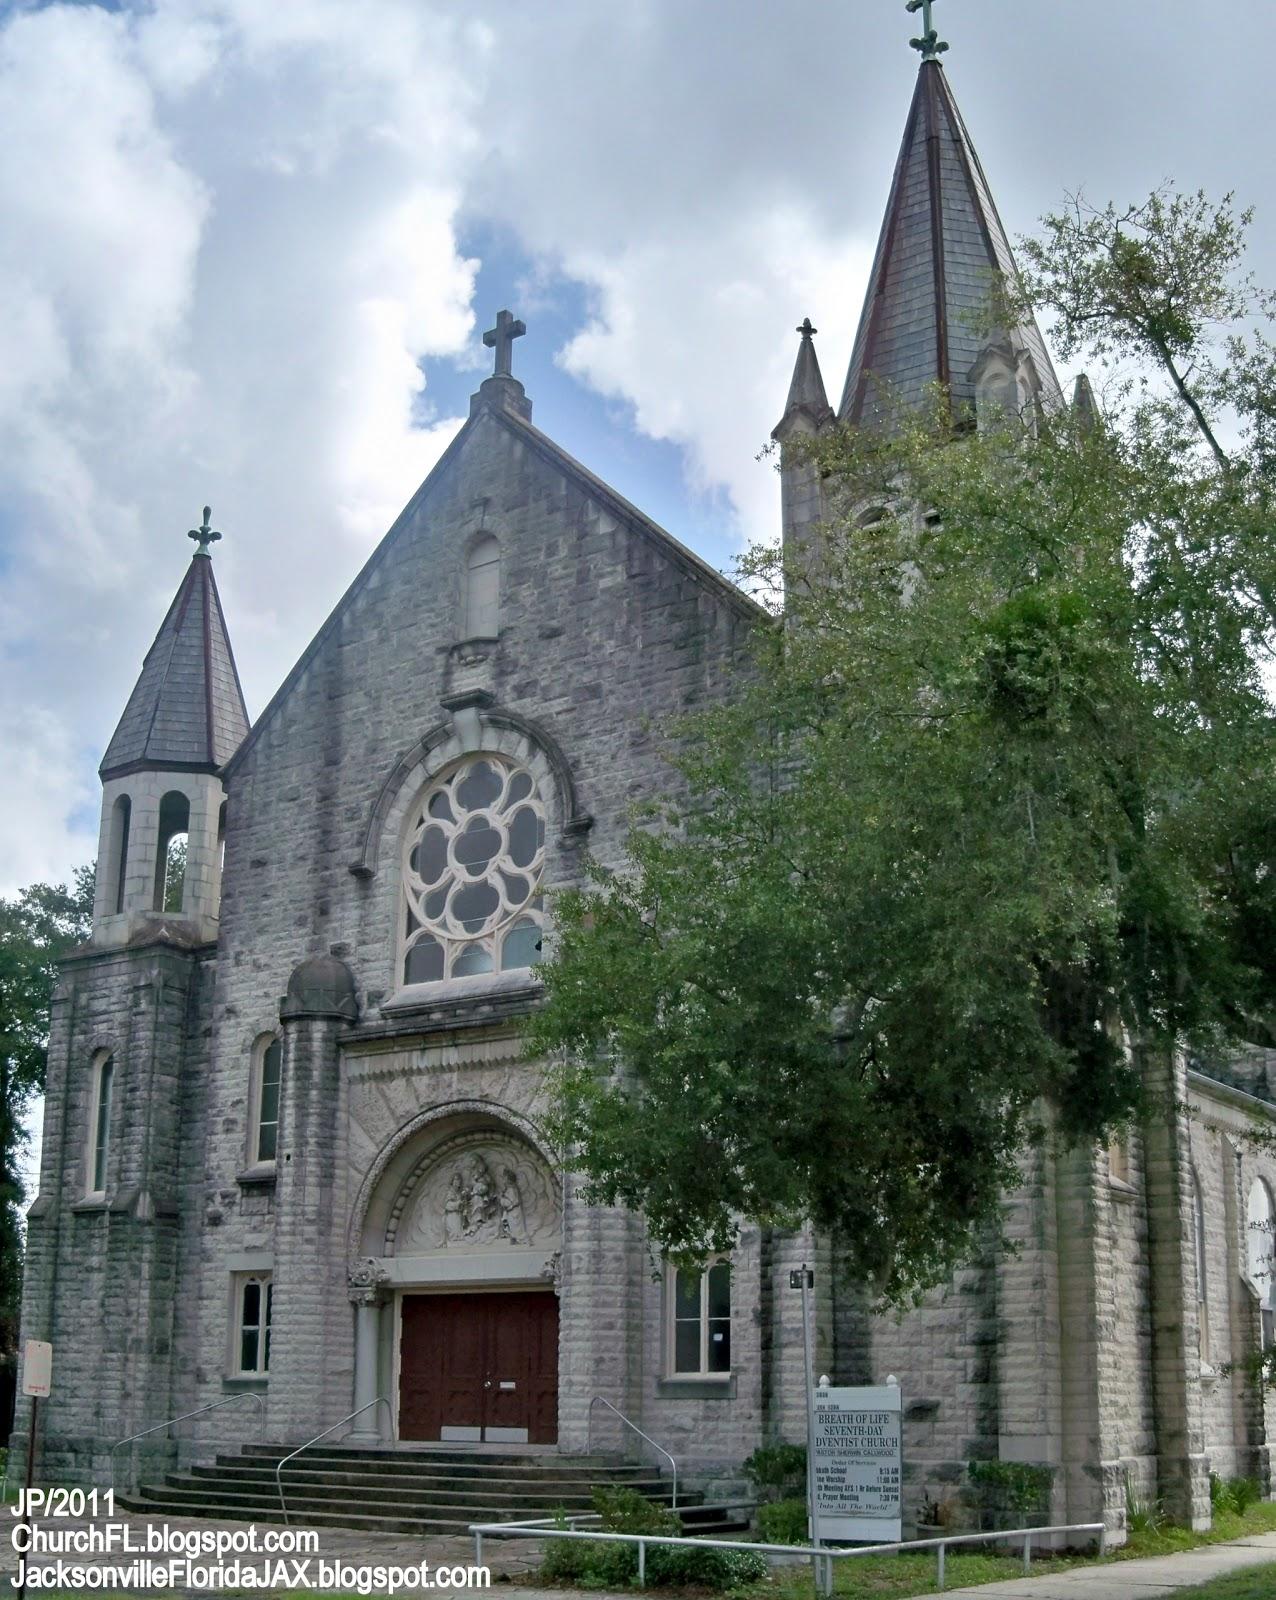 http://2.bp.blogspot.com/-O50E9k1zR2s/TmO0hksgjMI/AAAAAAAEbfg/OLfyOzYR3dk/s1600/SEVENTH-DAY+ADVENTIST+CHURCH+JACKSONVILLE+FLORIDA%252C+Breath+of+Life+Seventh+Day+Adventist+Church+Jacksonville+JAX+FL..JPG